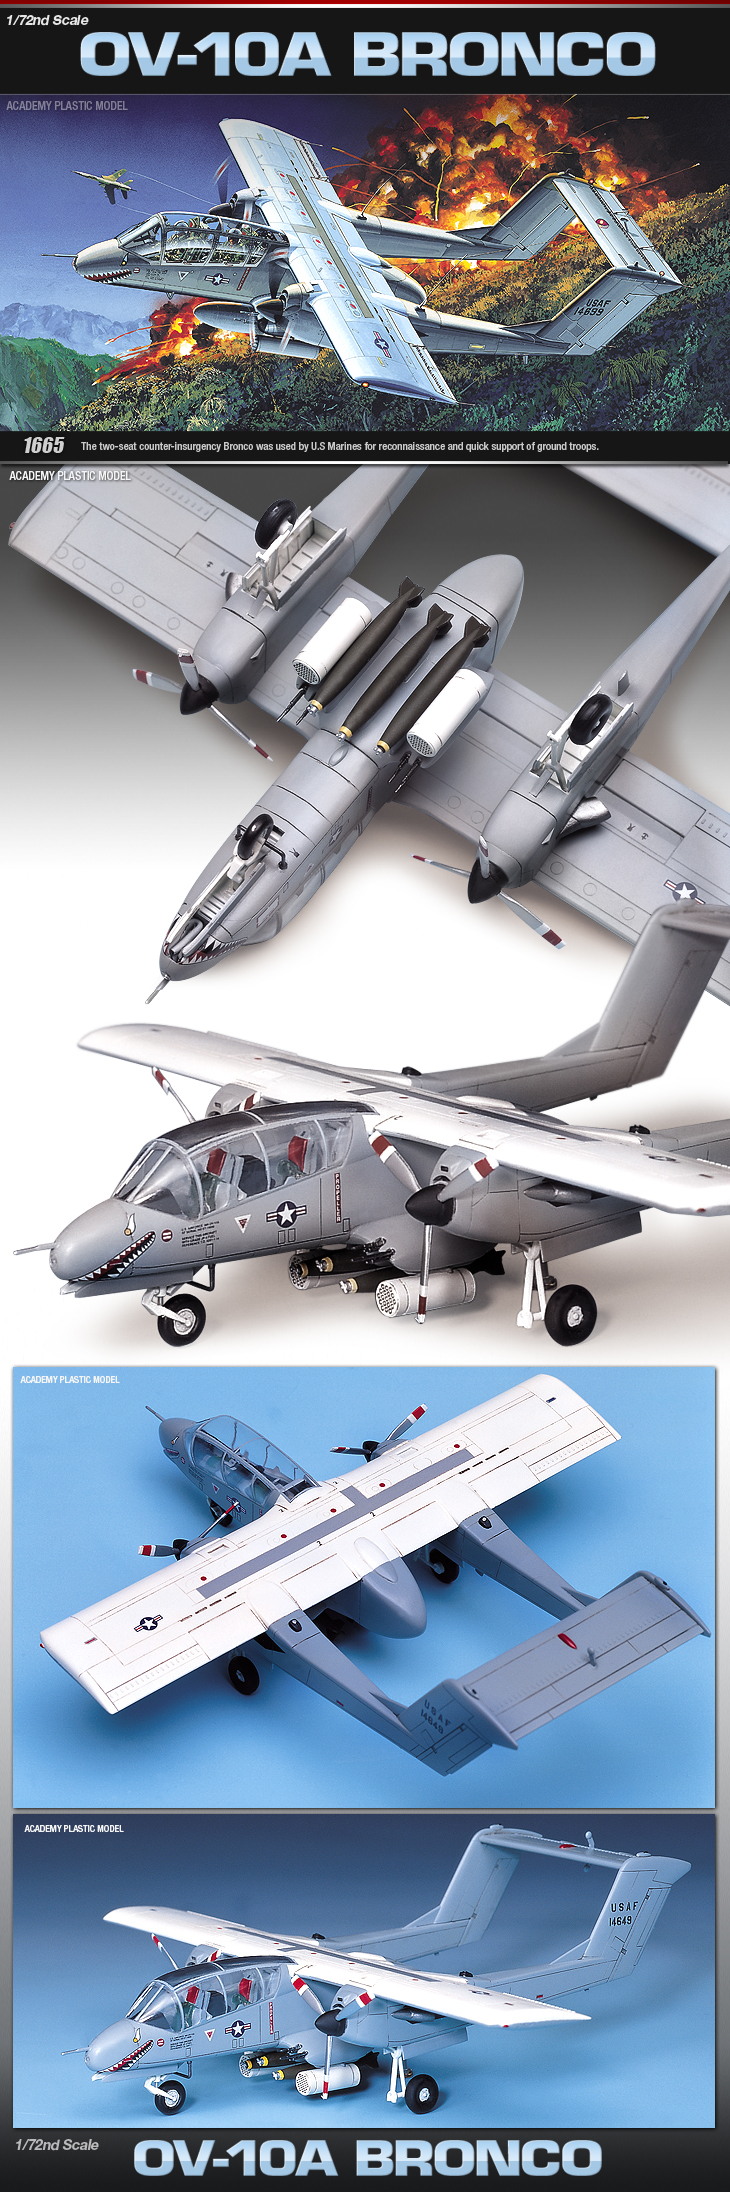 Academy 1//72  OV-10A Bronco Plastic Model Kit  #12463 NISB